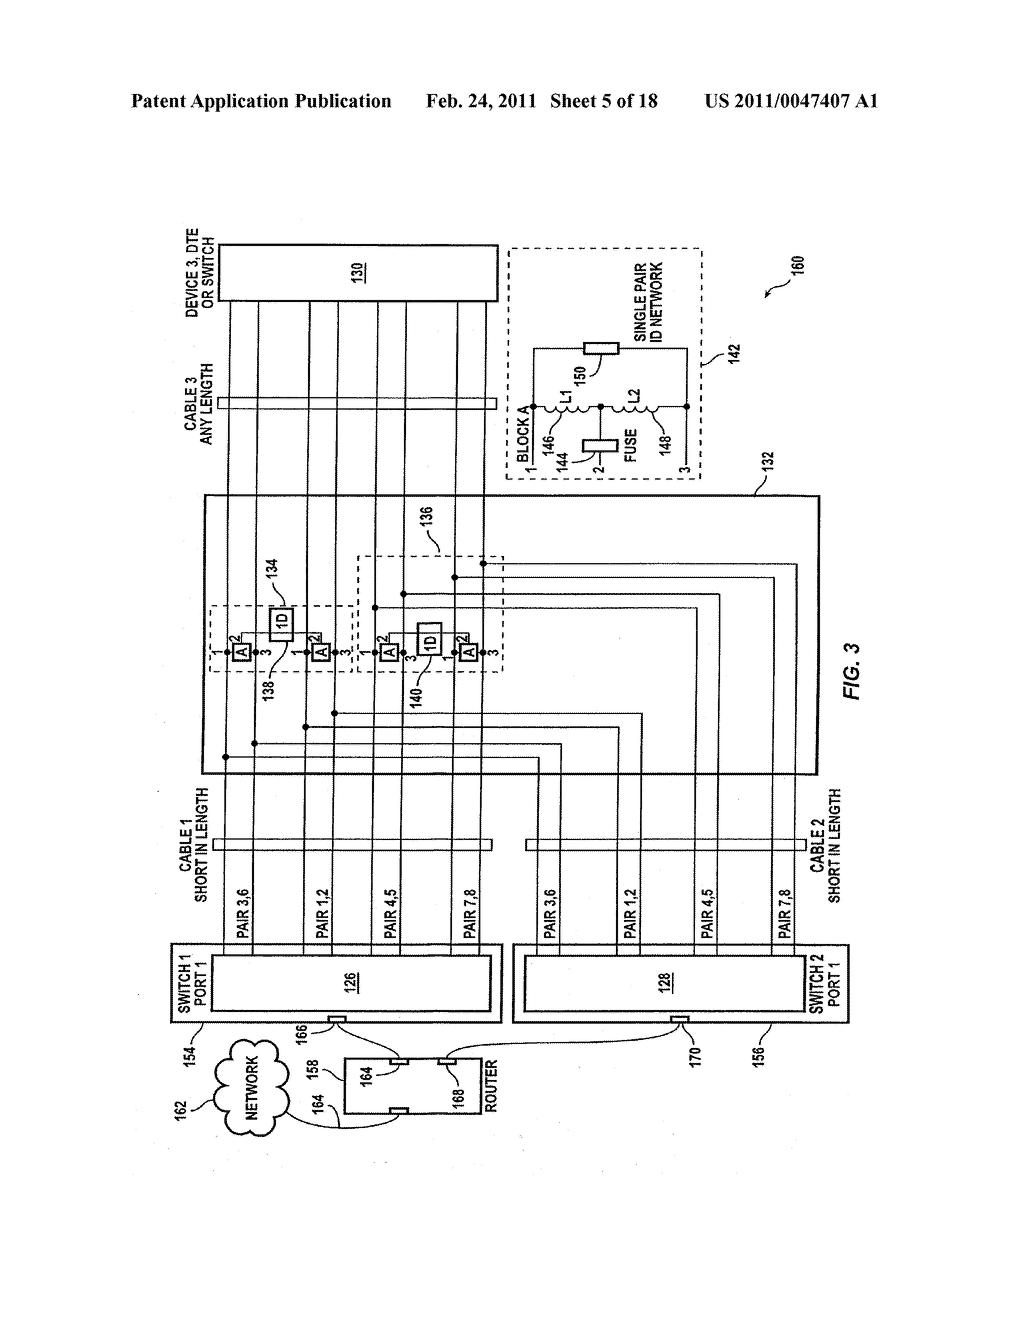 warn 2 5ci diagram aircraft electrical contactor diagram